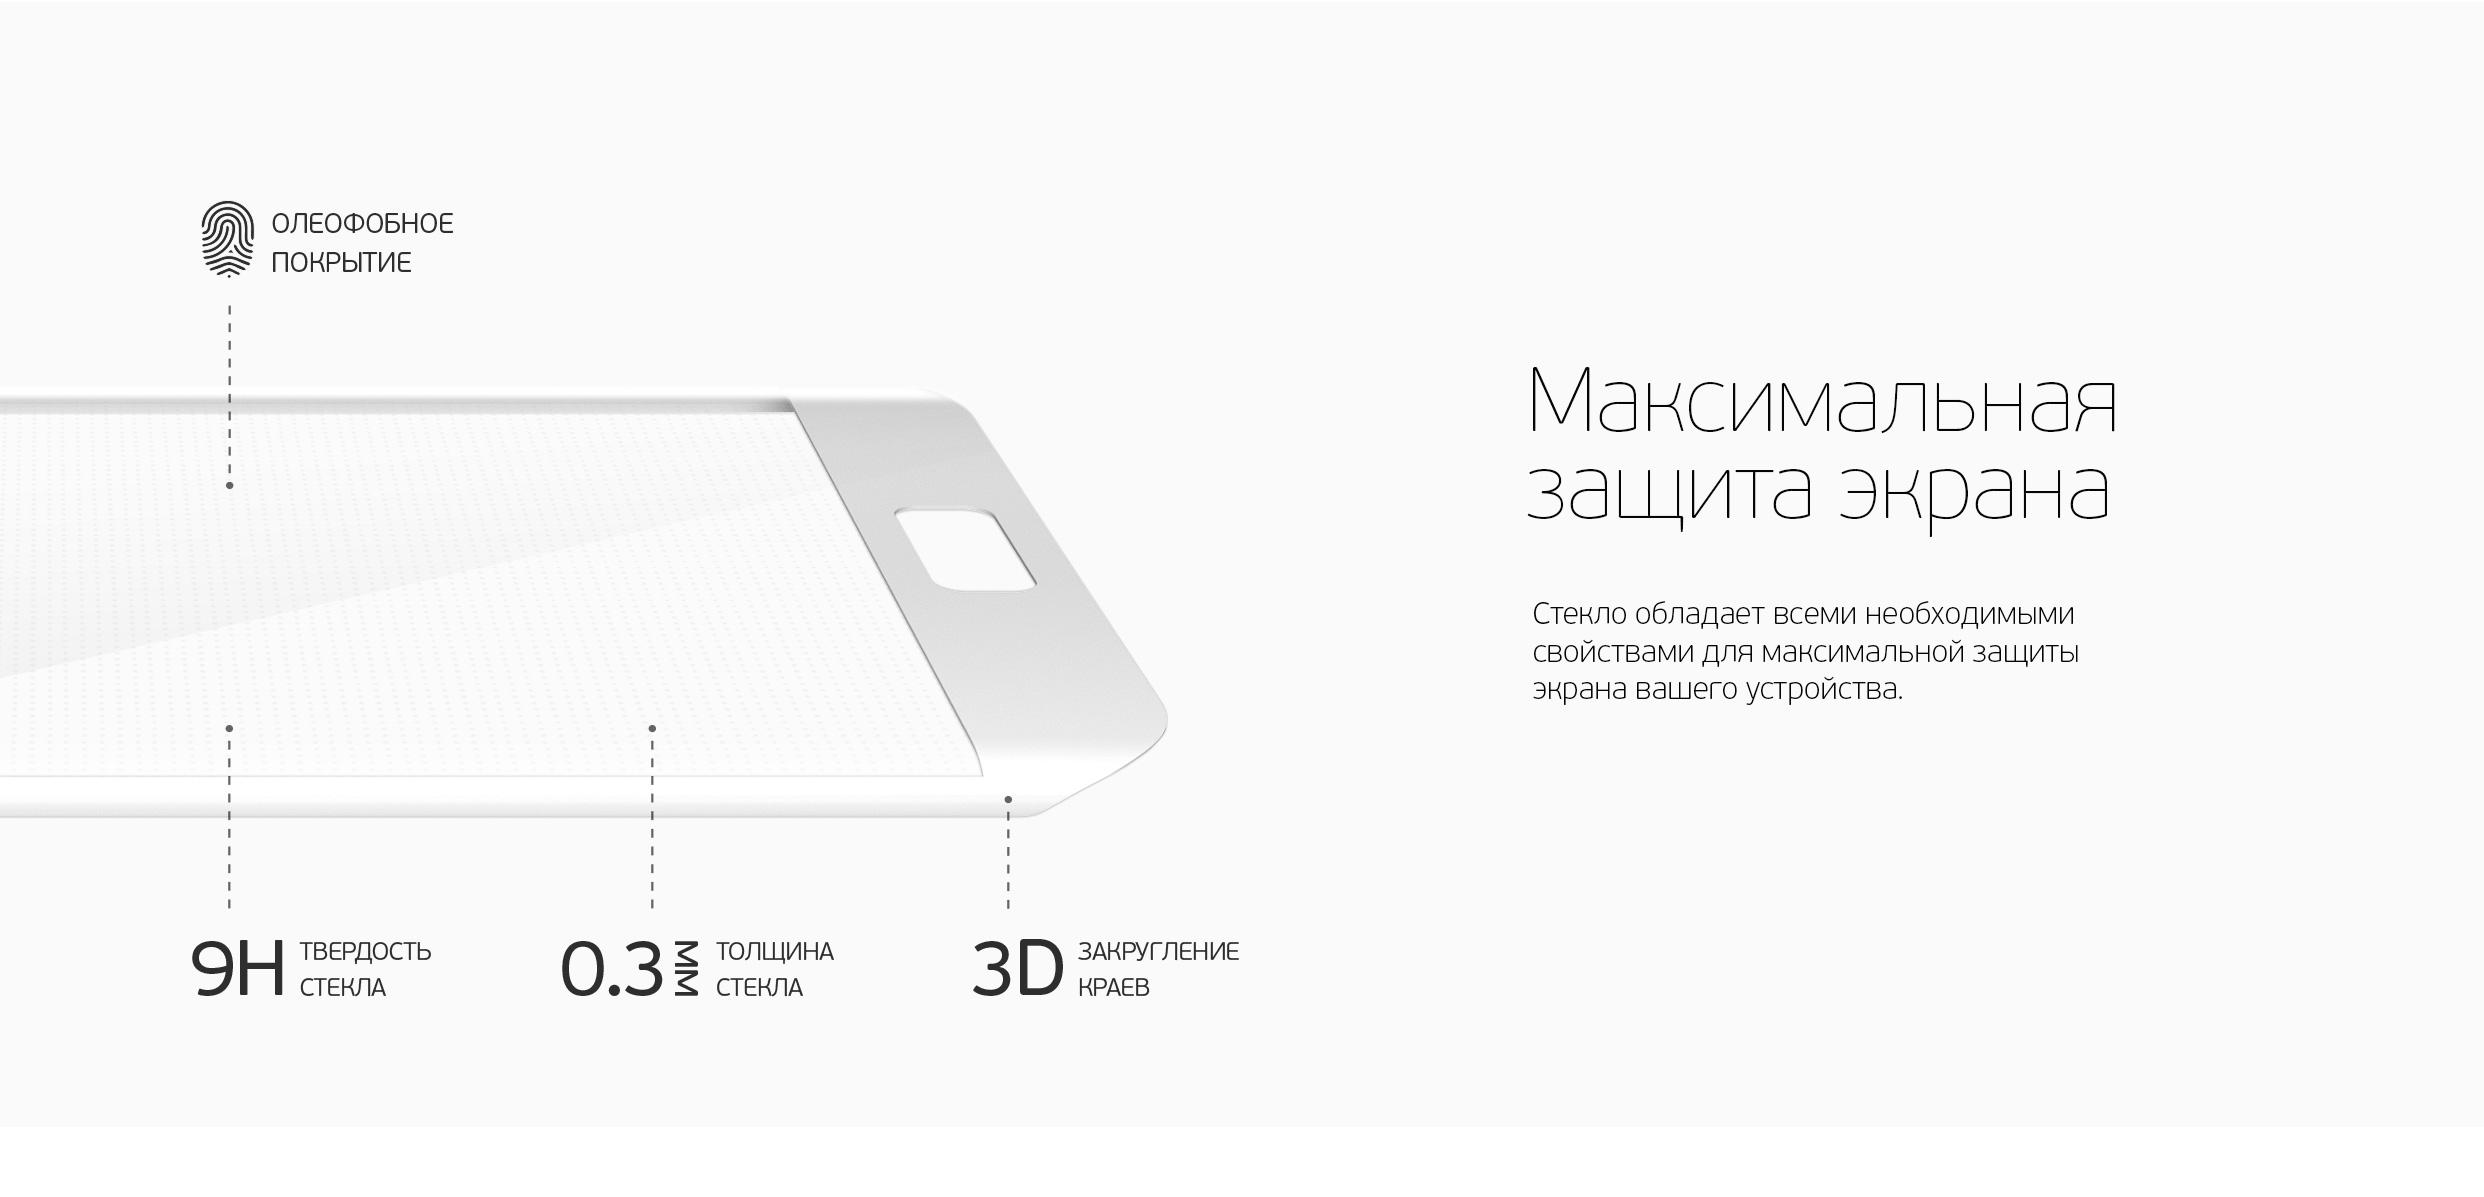 3D-Glass-Samsung-GalaxyS7-final-RUS_02.jpg